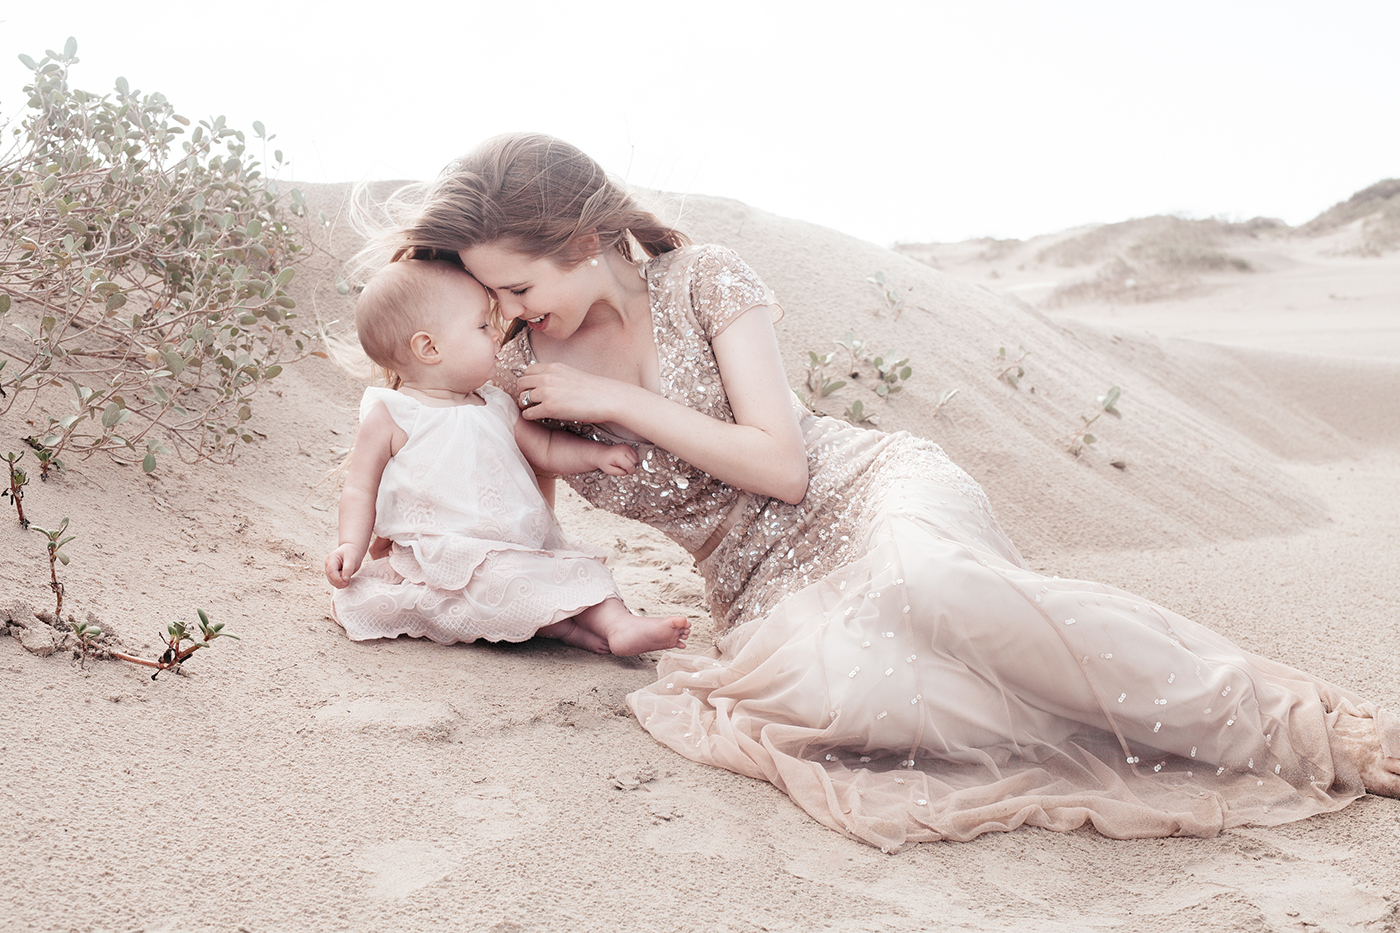 anna-kraft-photography-family-portrait-studio-georgetown15.jpg